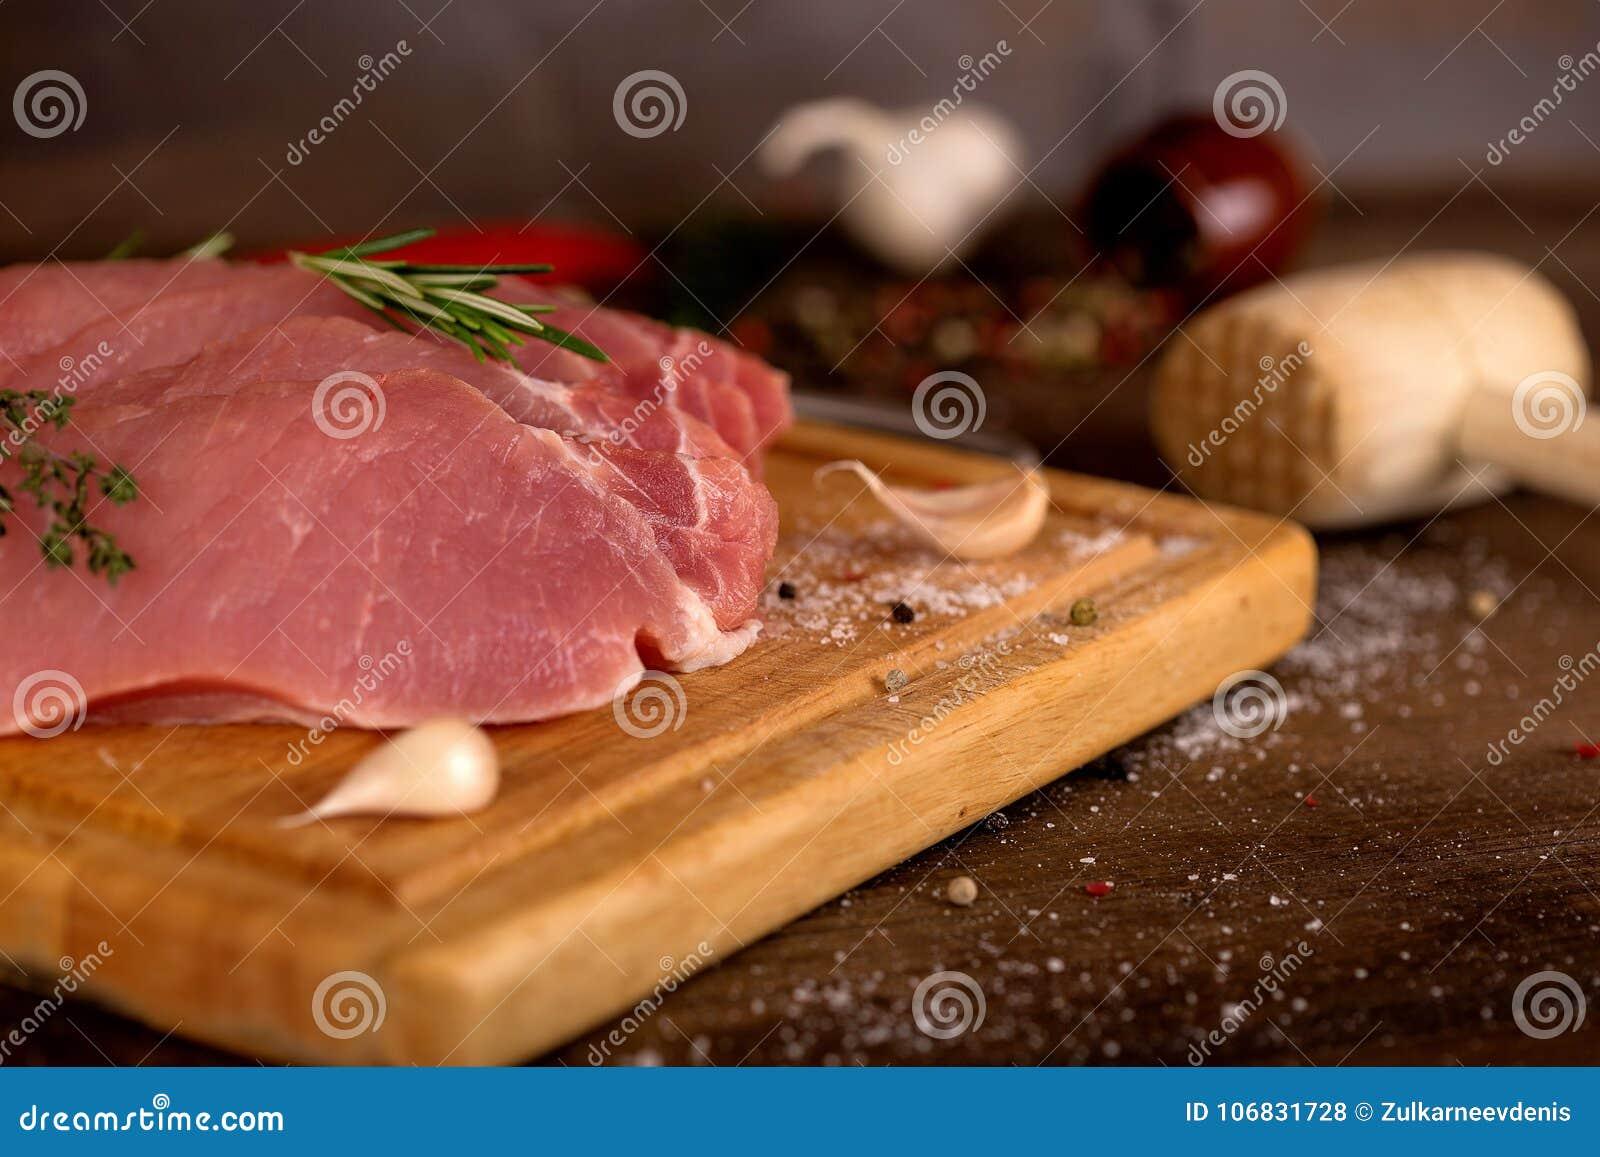 Surowego mięsa plasterki na desce